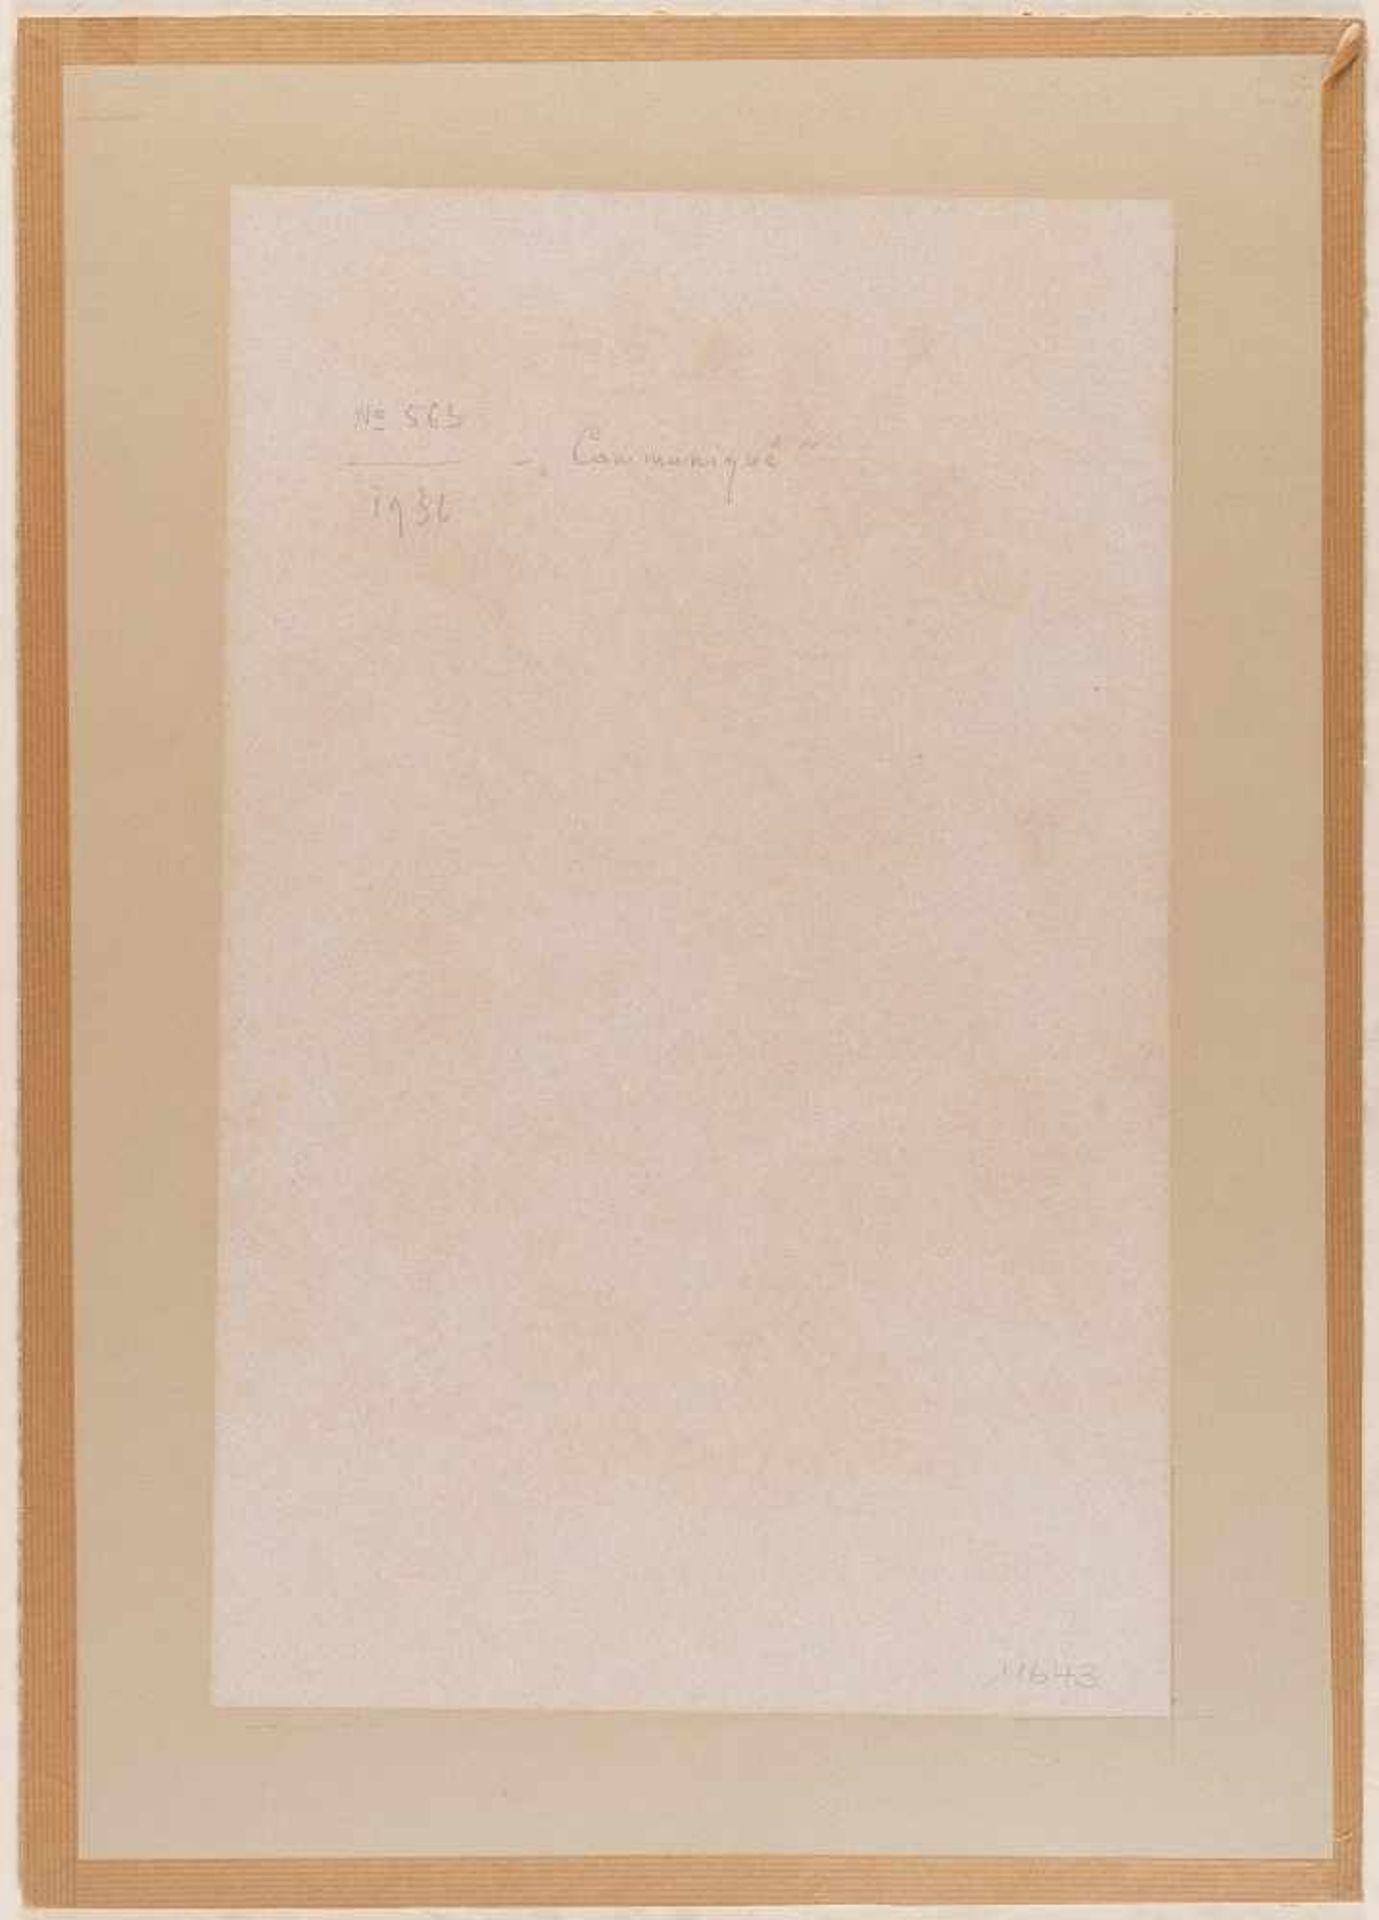 Wassily Kandinsky - Bild 3 aus 3